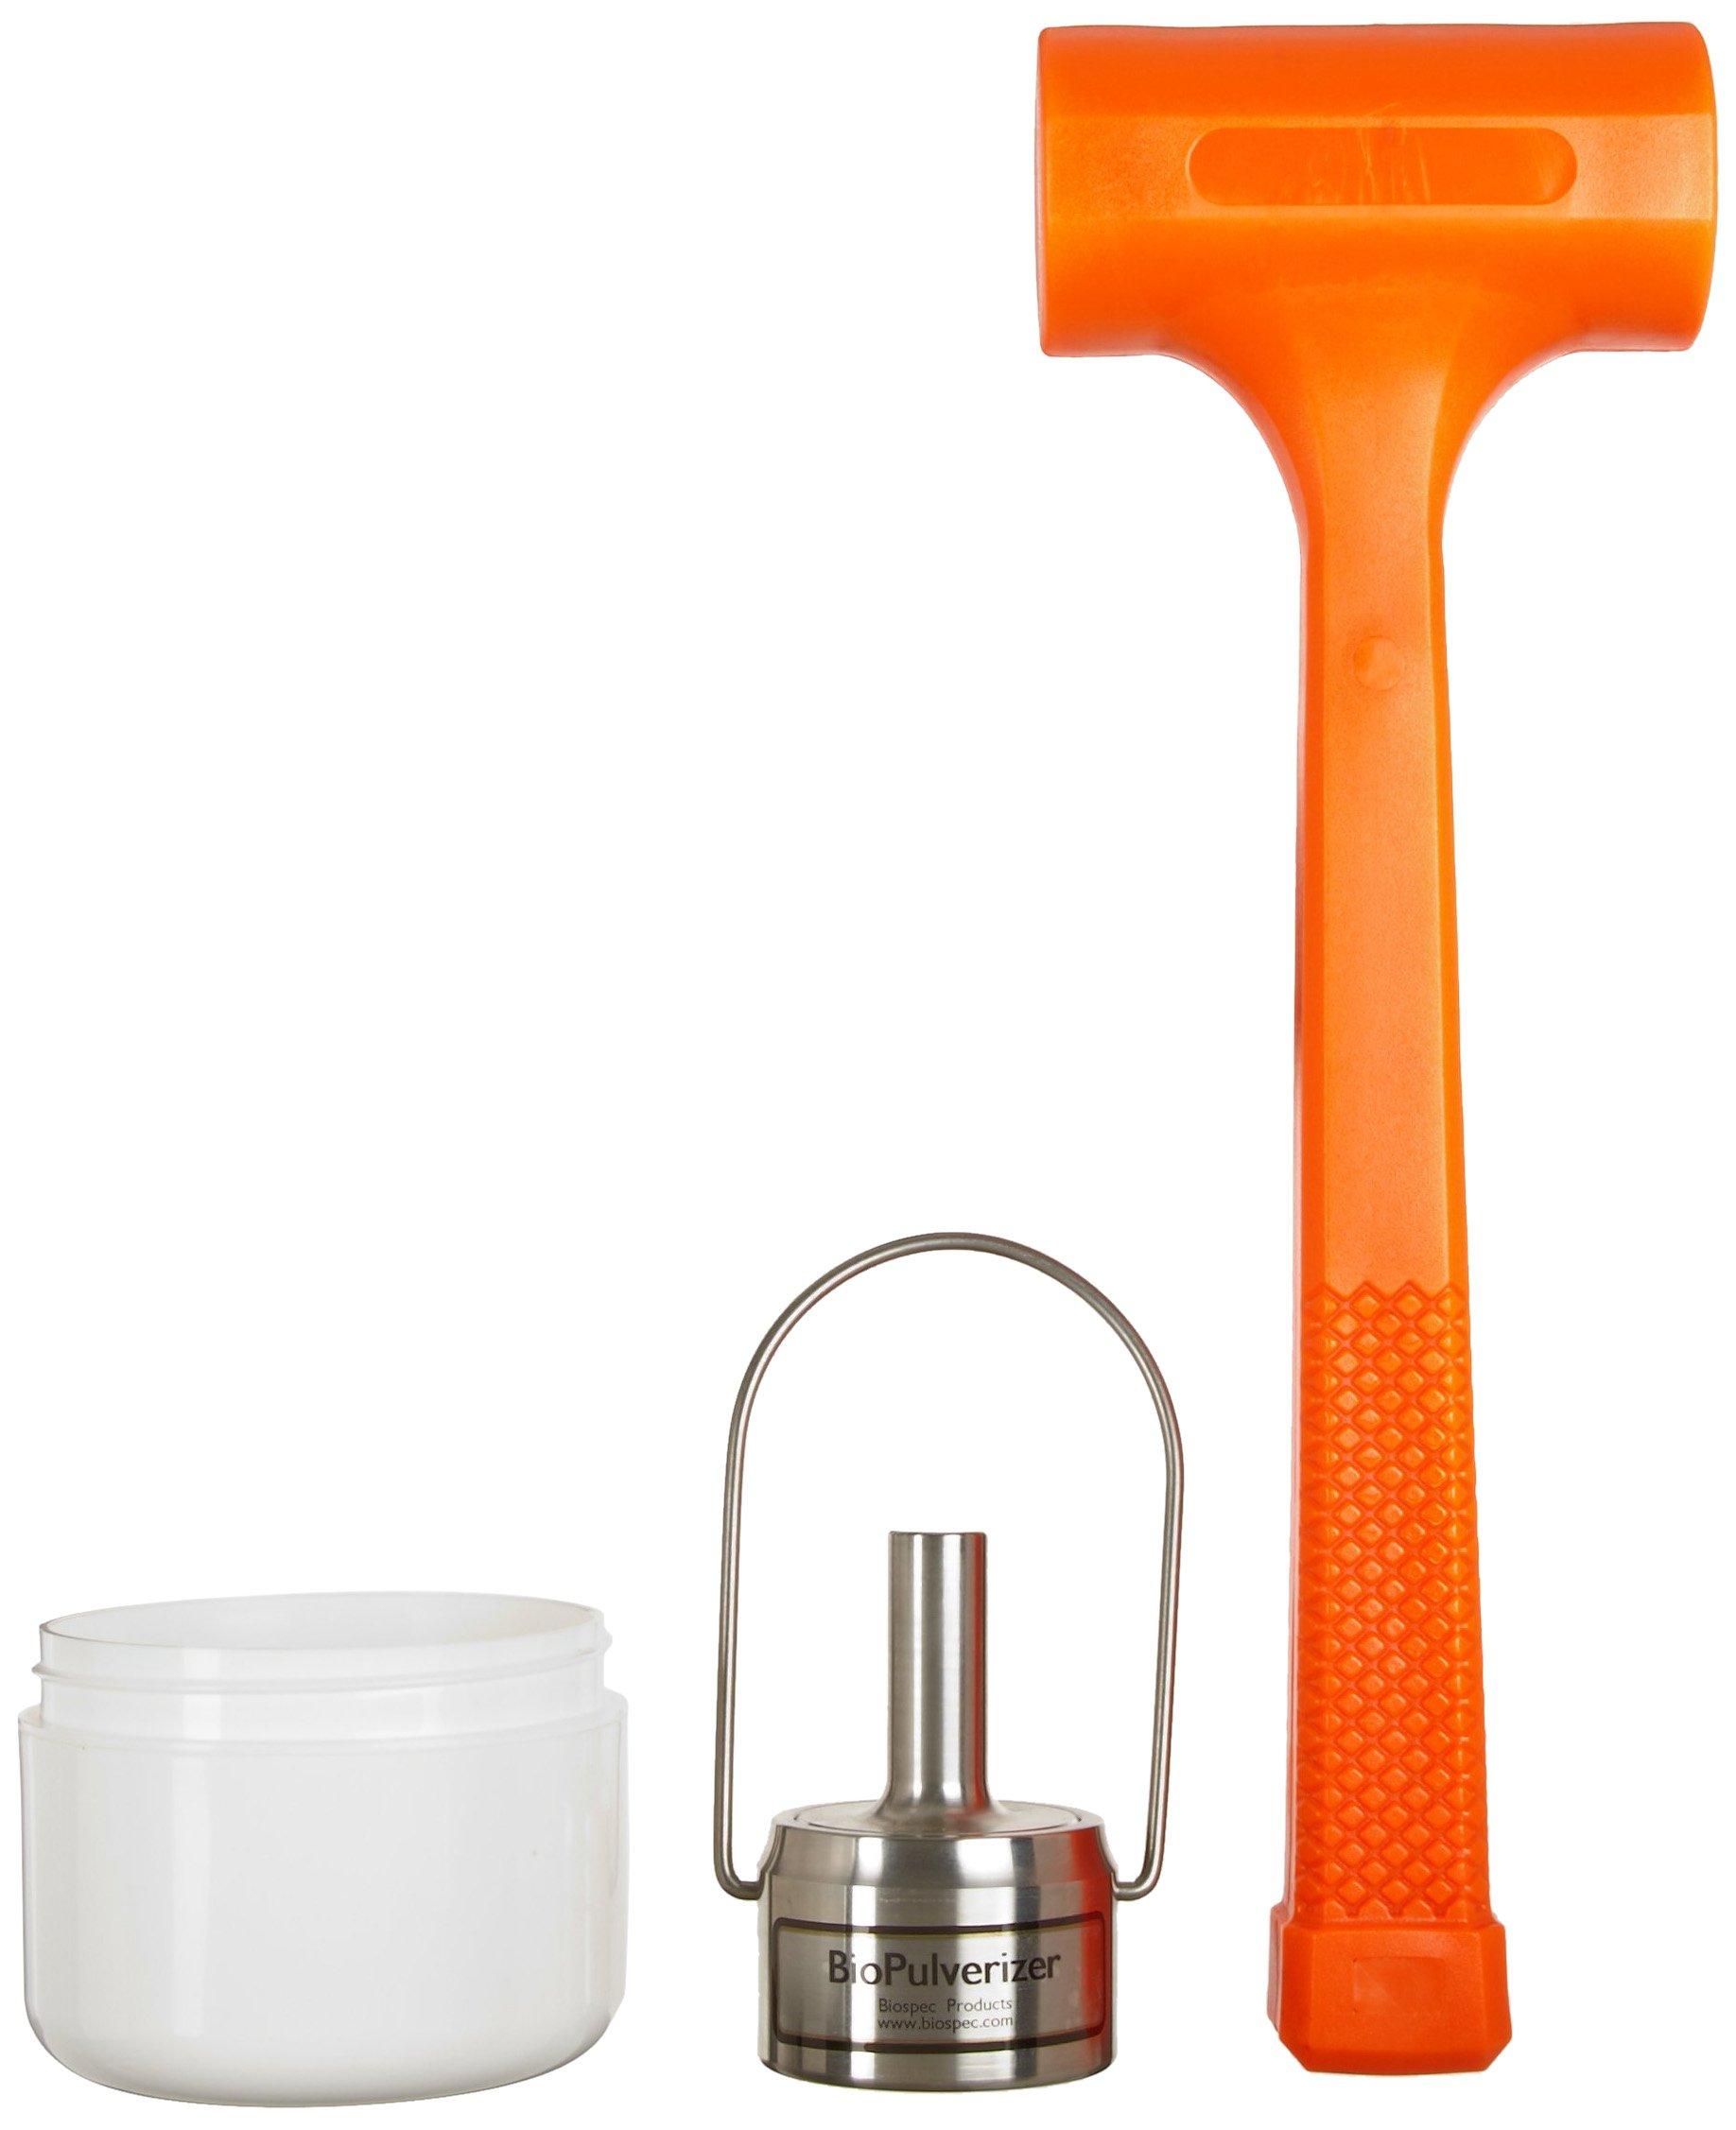 BioSpec 59014N 316 Stainless Steel BioPulverizer with Hammer, 1-10g Capacity